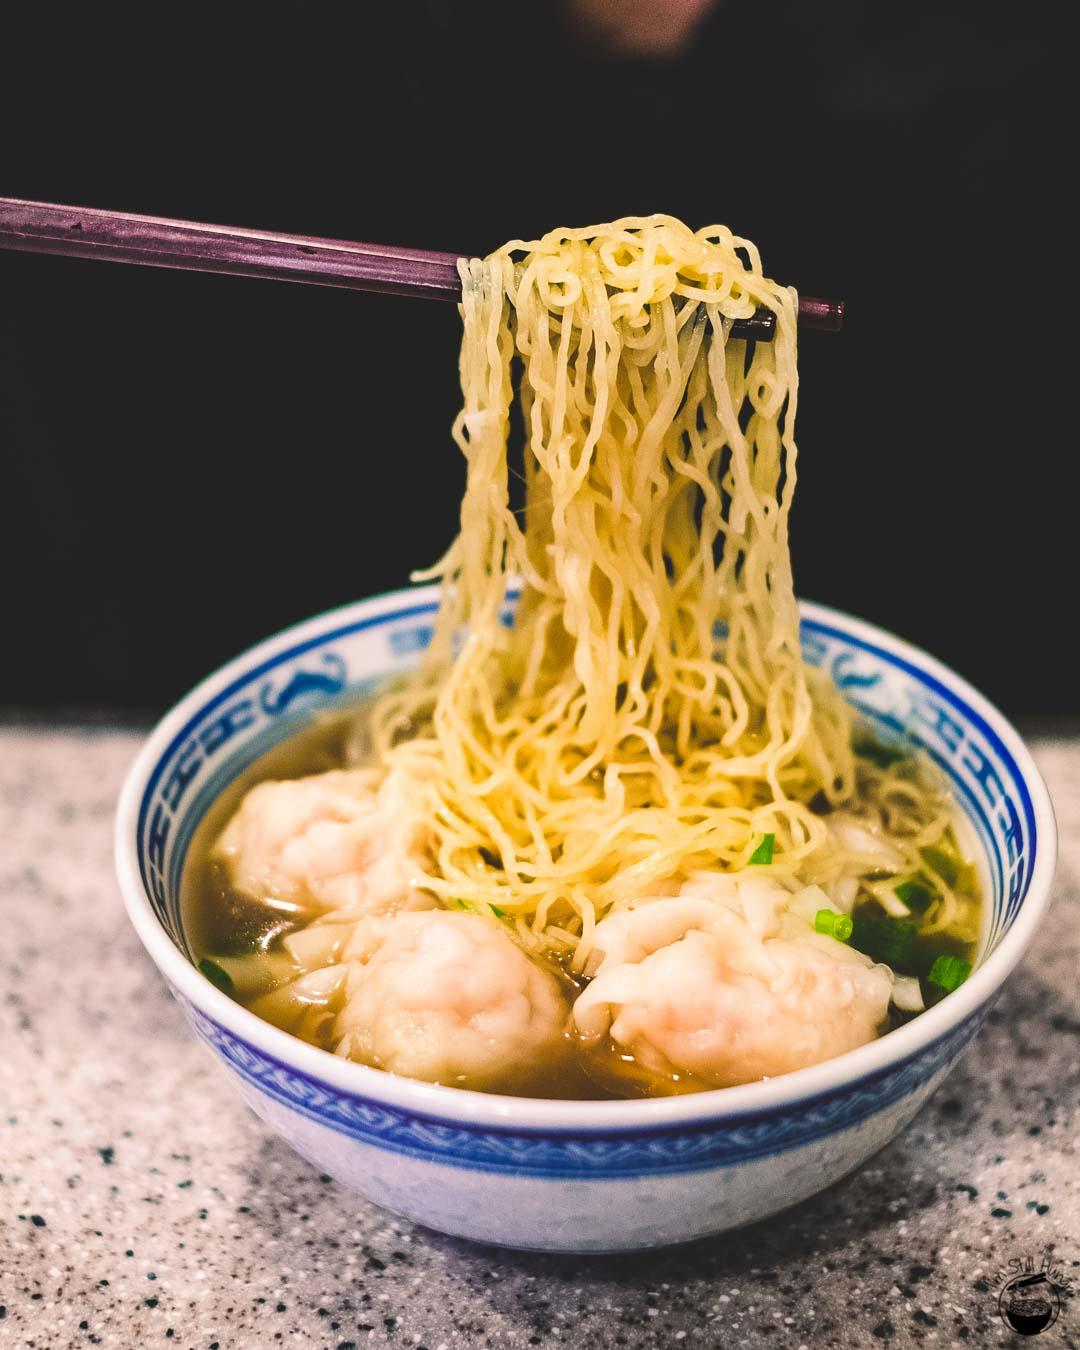 Tsim Chai Kee Hong Kong King prawn wonton noodles